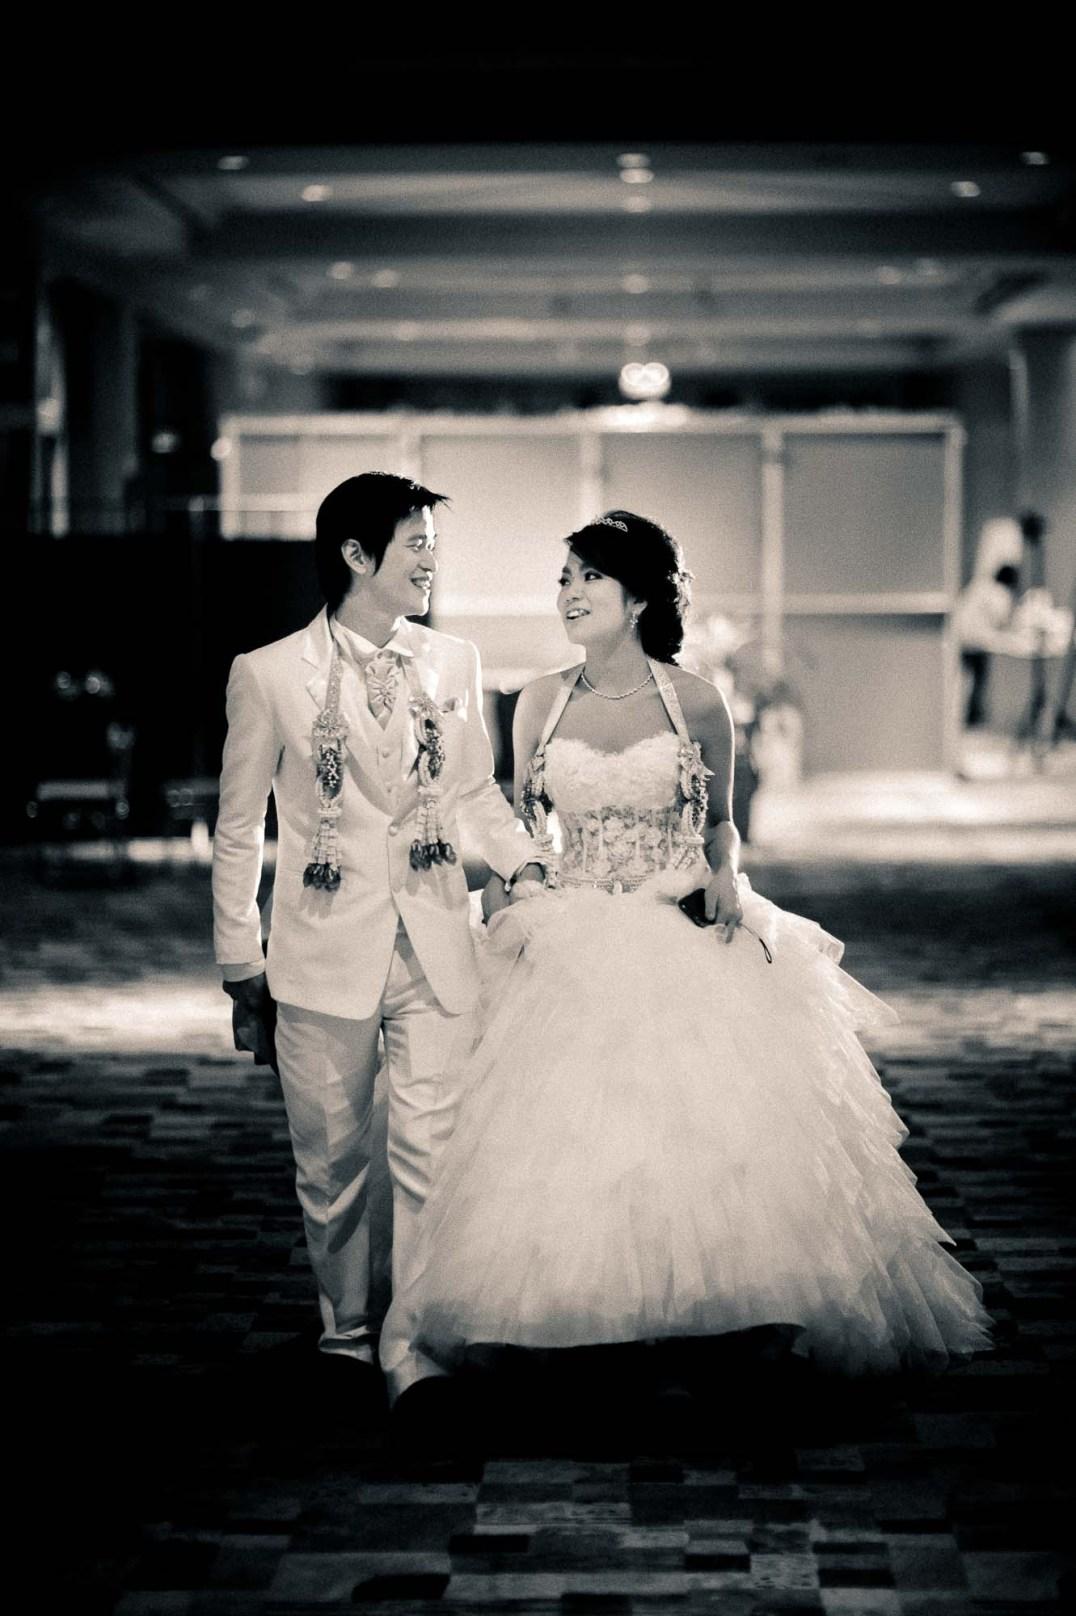 Thailand Bangkok Miracle Grand Convention Hotel Wedding Photography | NET-Photography Thailand Wedding Photographer